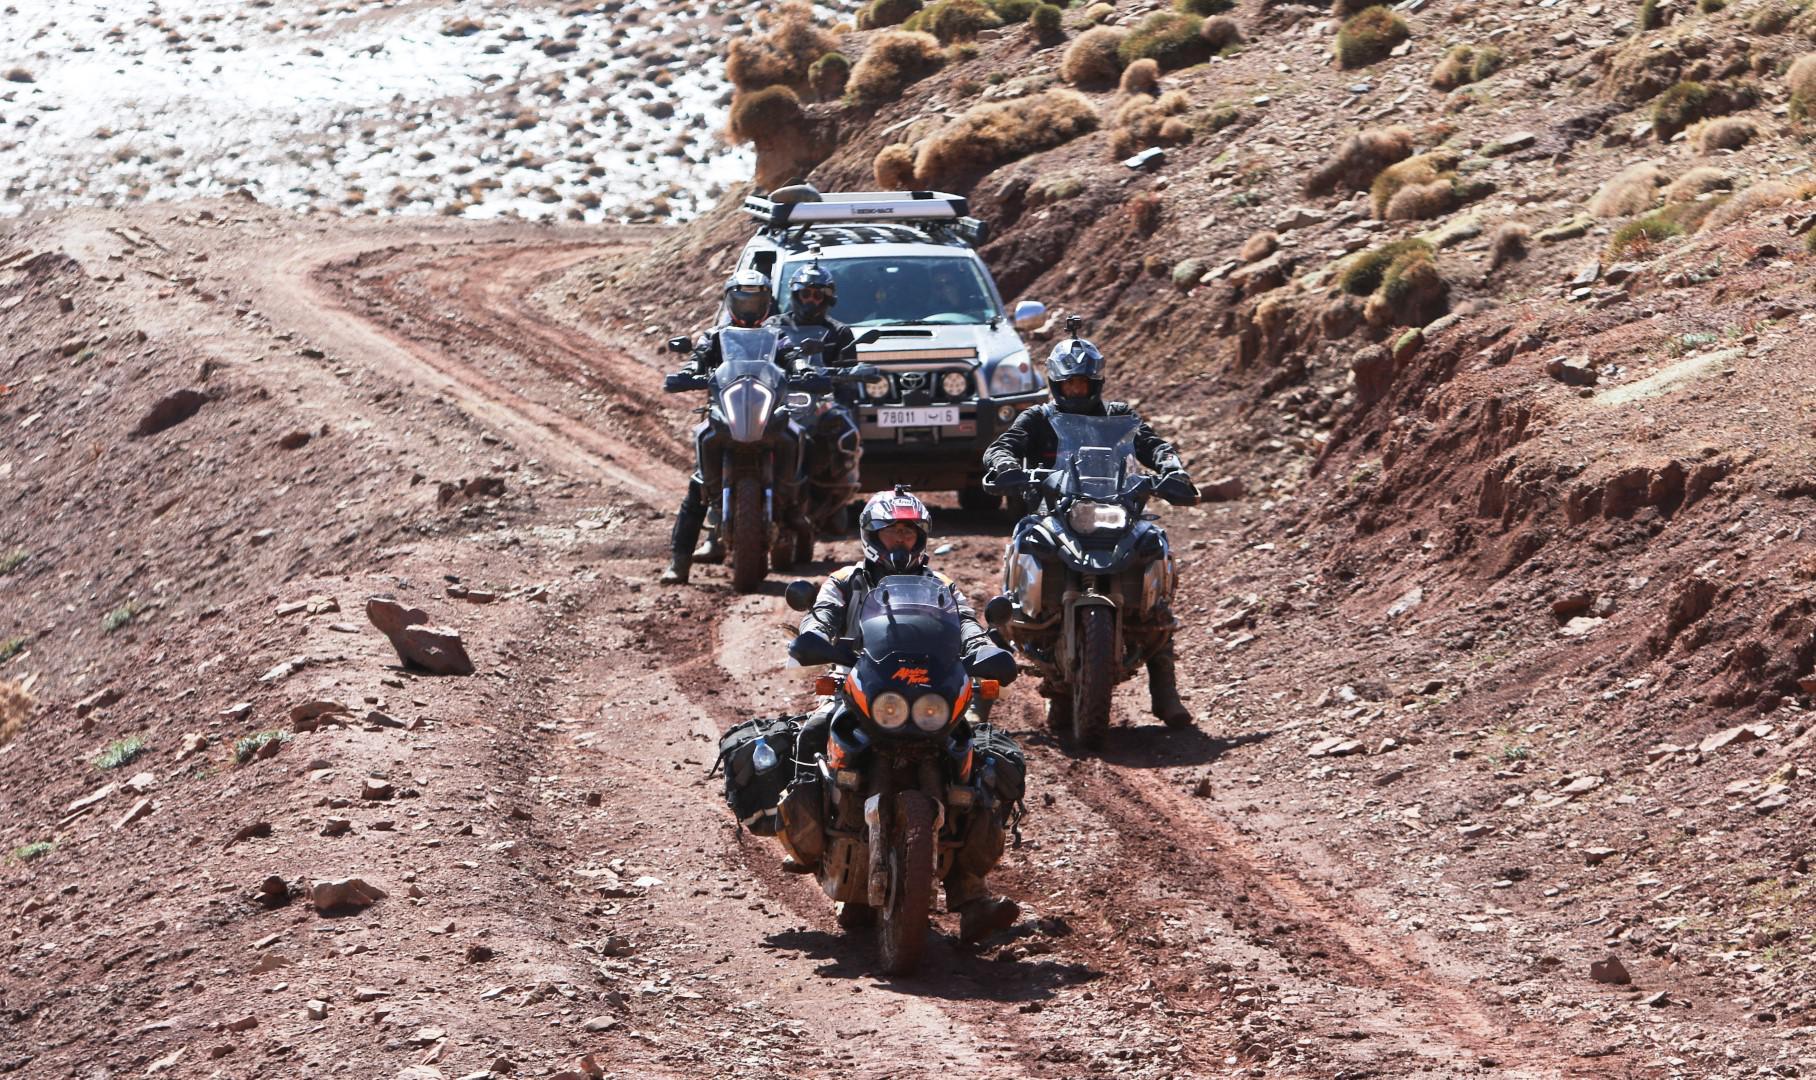 le-morocco-tizi-challenge-est-en-piste-1257-8.jpg